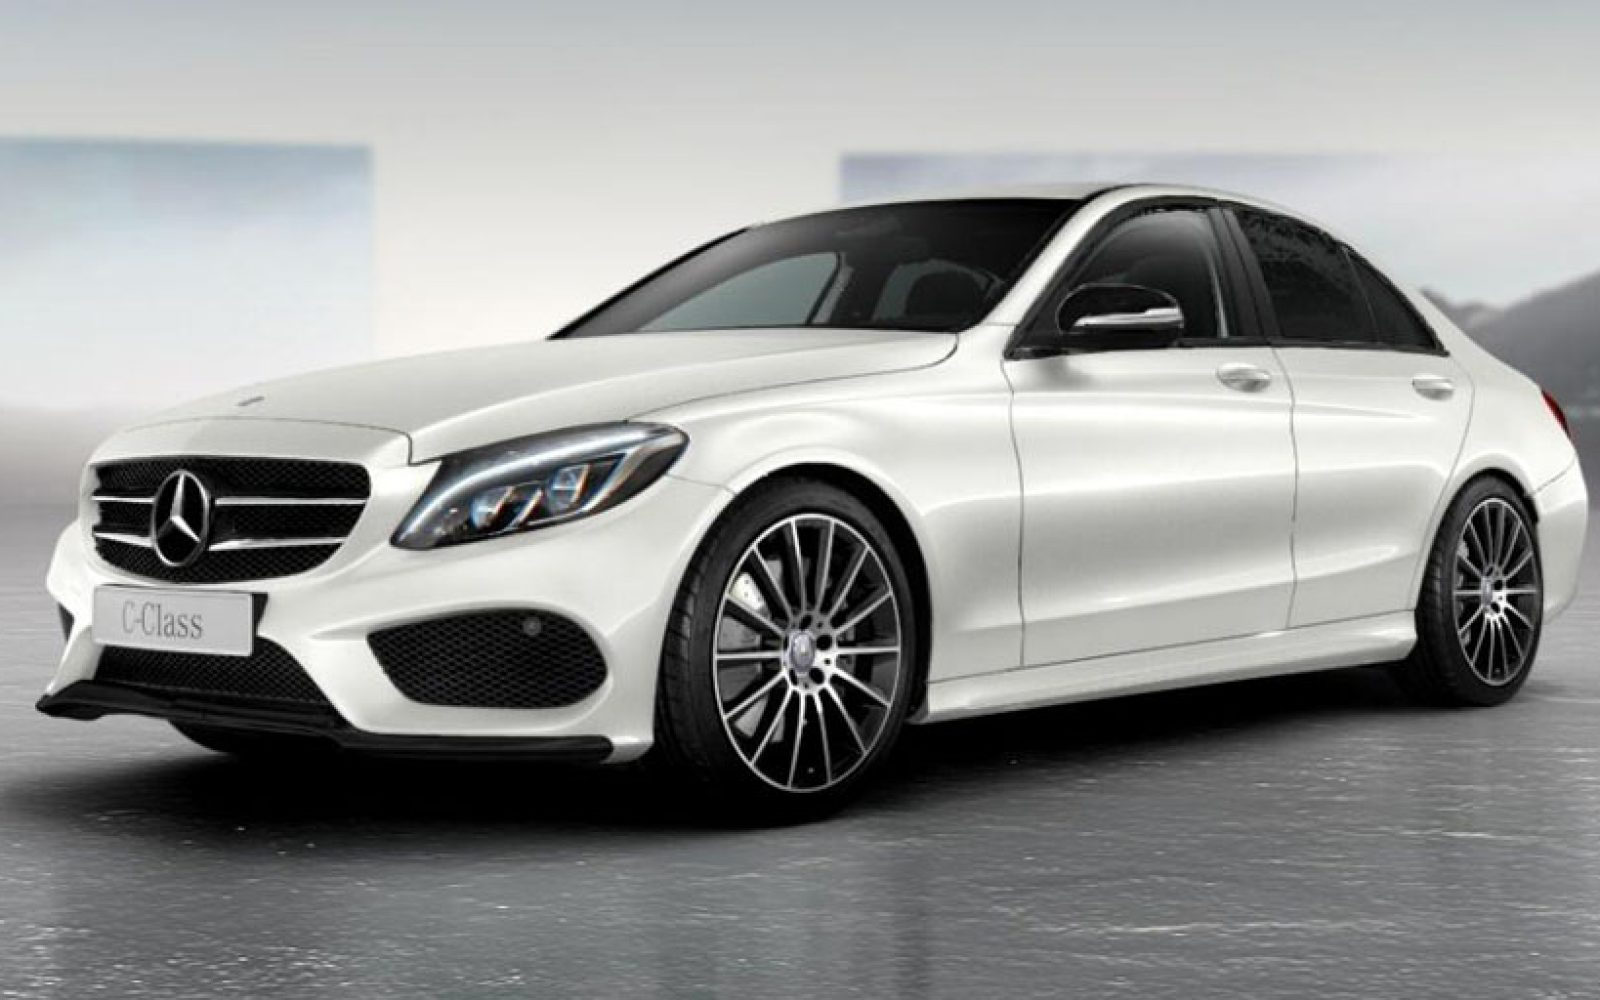 Mercedes' CarPlay plans revealed in leaked dealer memo